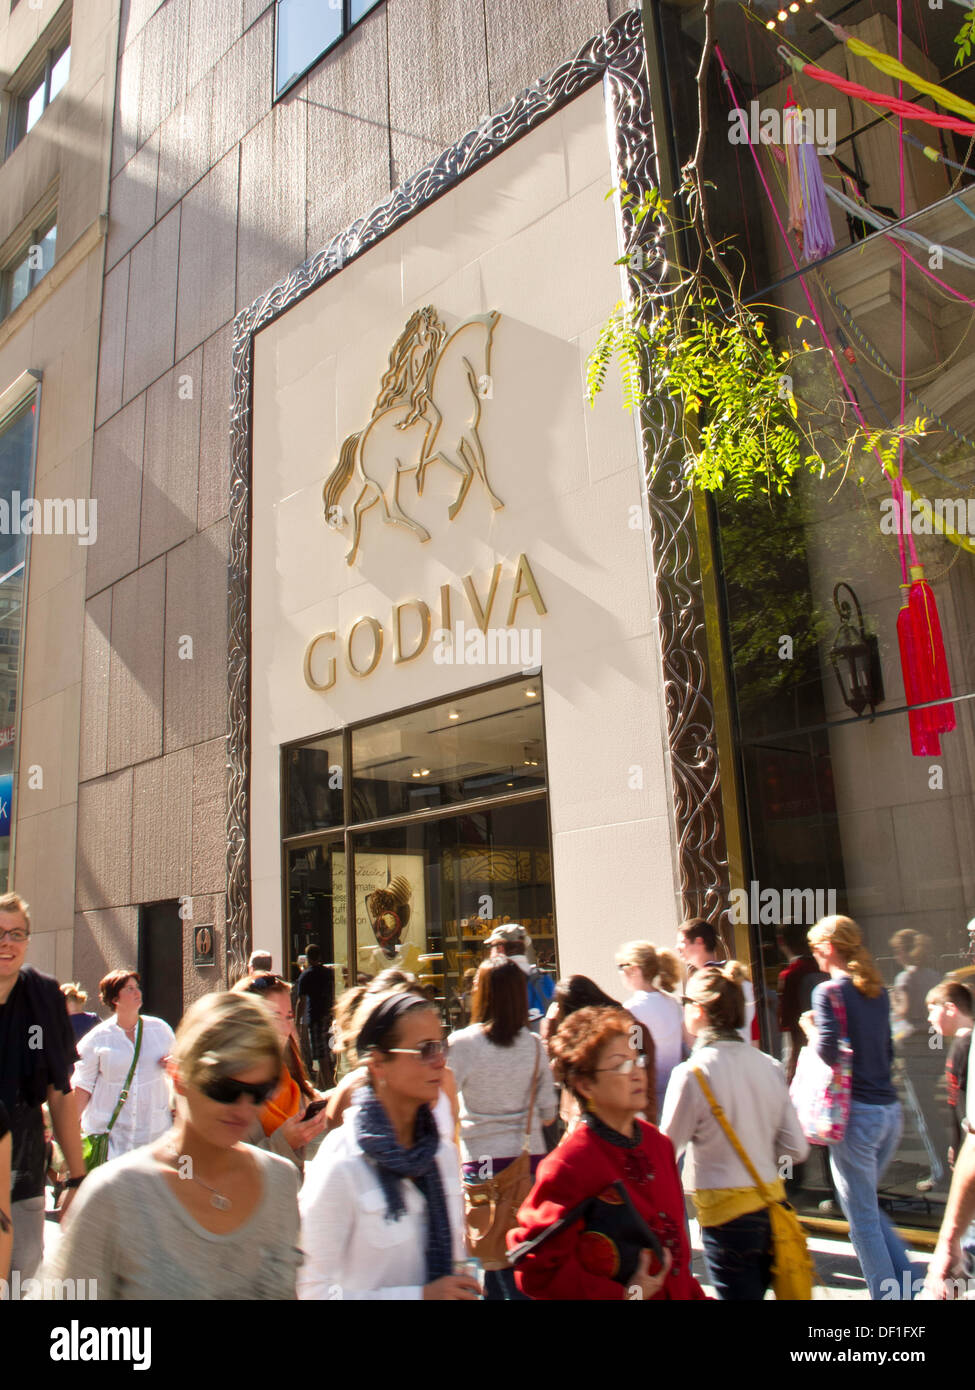 Godiva Chocolate Store Facade, Fifth Avenue, NYC Stock Photo ...